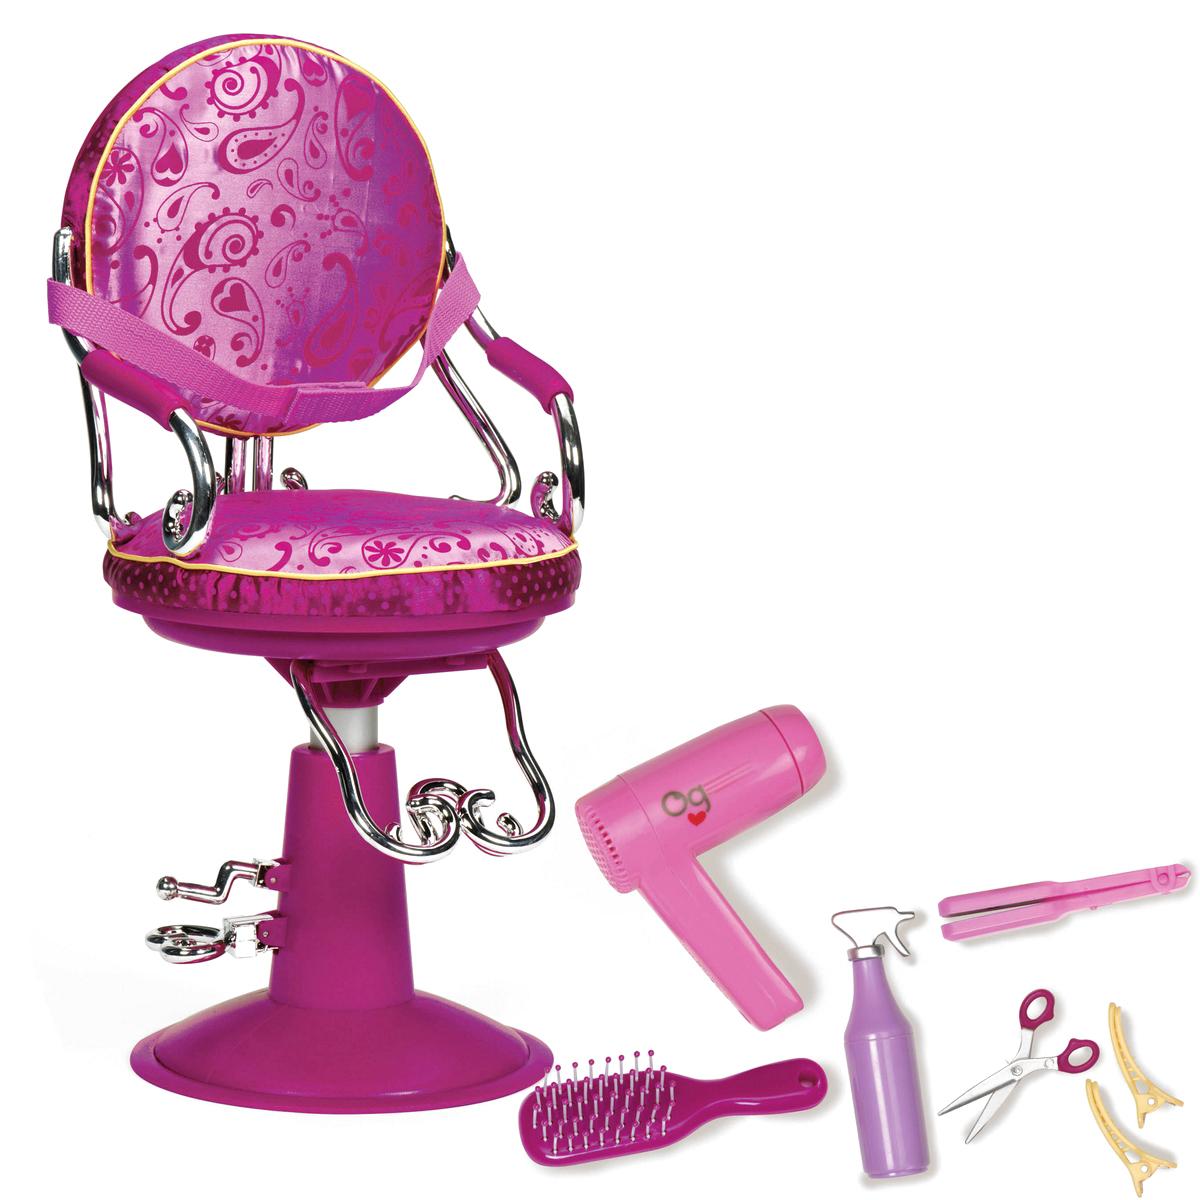 Our Generation Кресло парикмахерское с аксессуарами для куклы цены онлайн